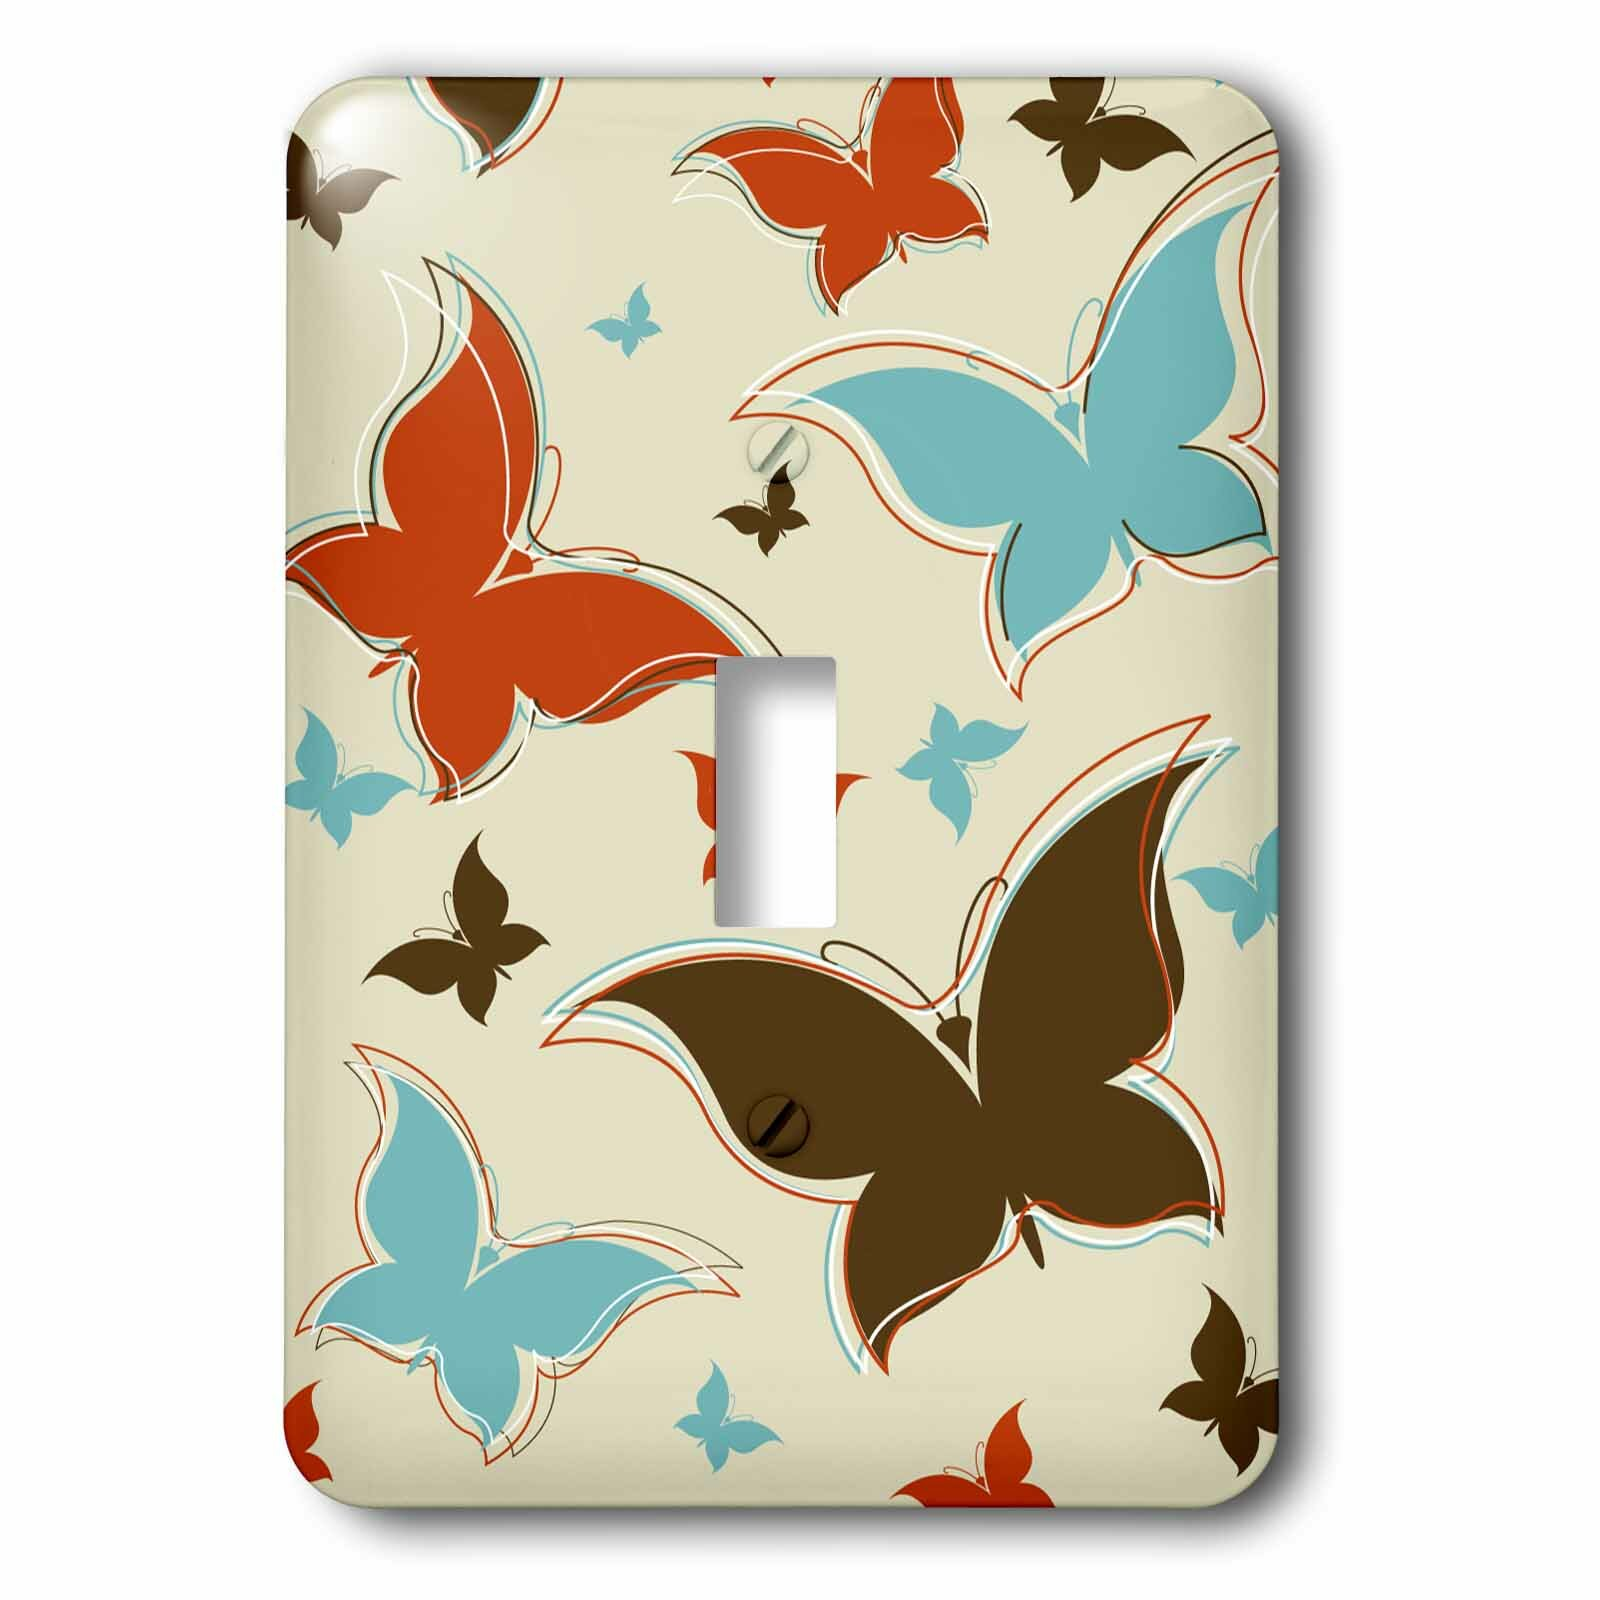 3drose Butterfly 1 Gang Toggle Light Switch Wall Plate Wayfair